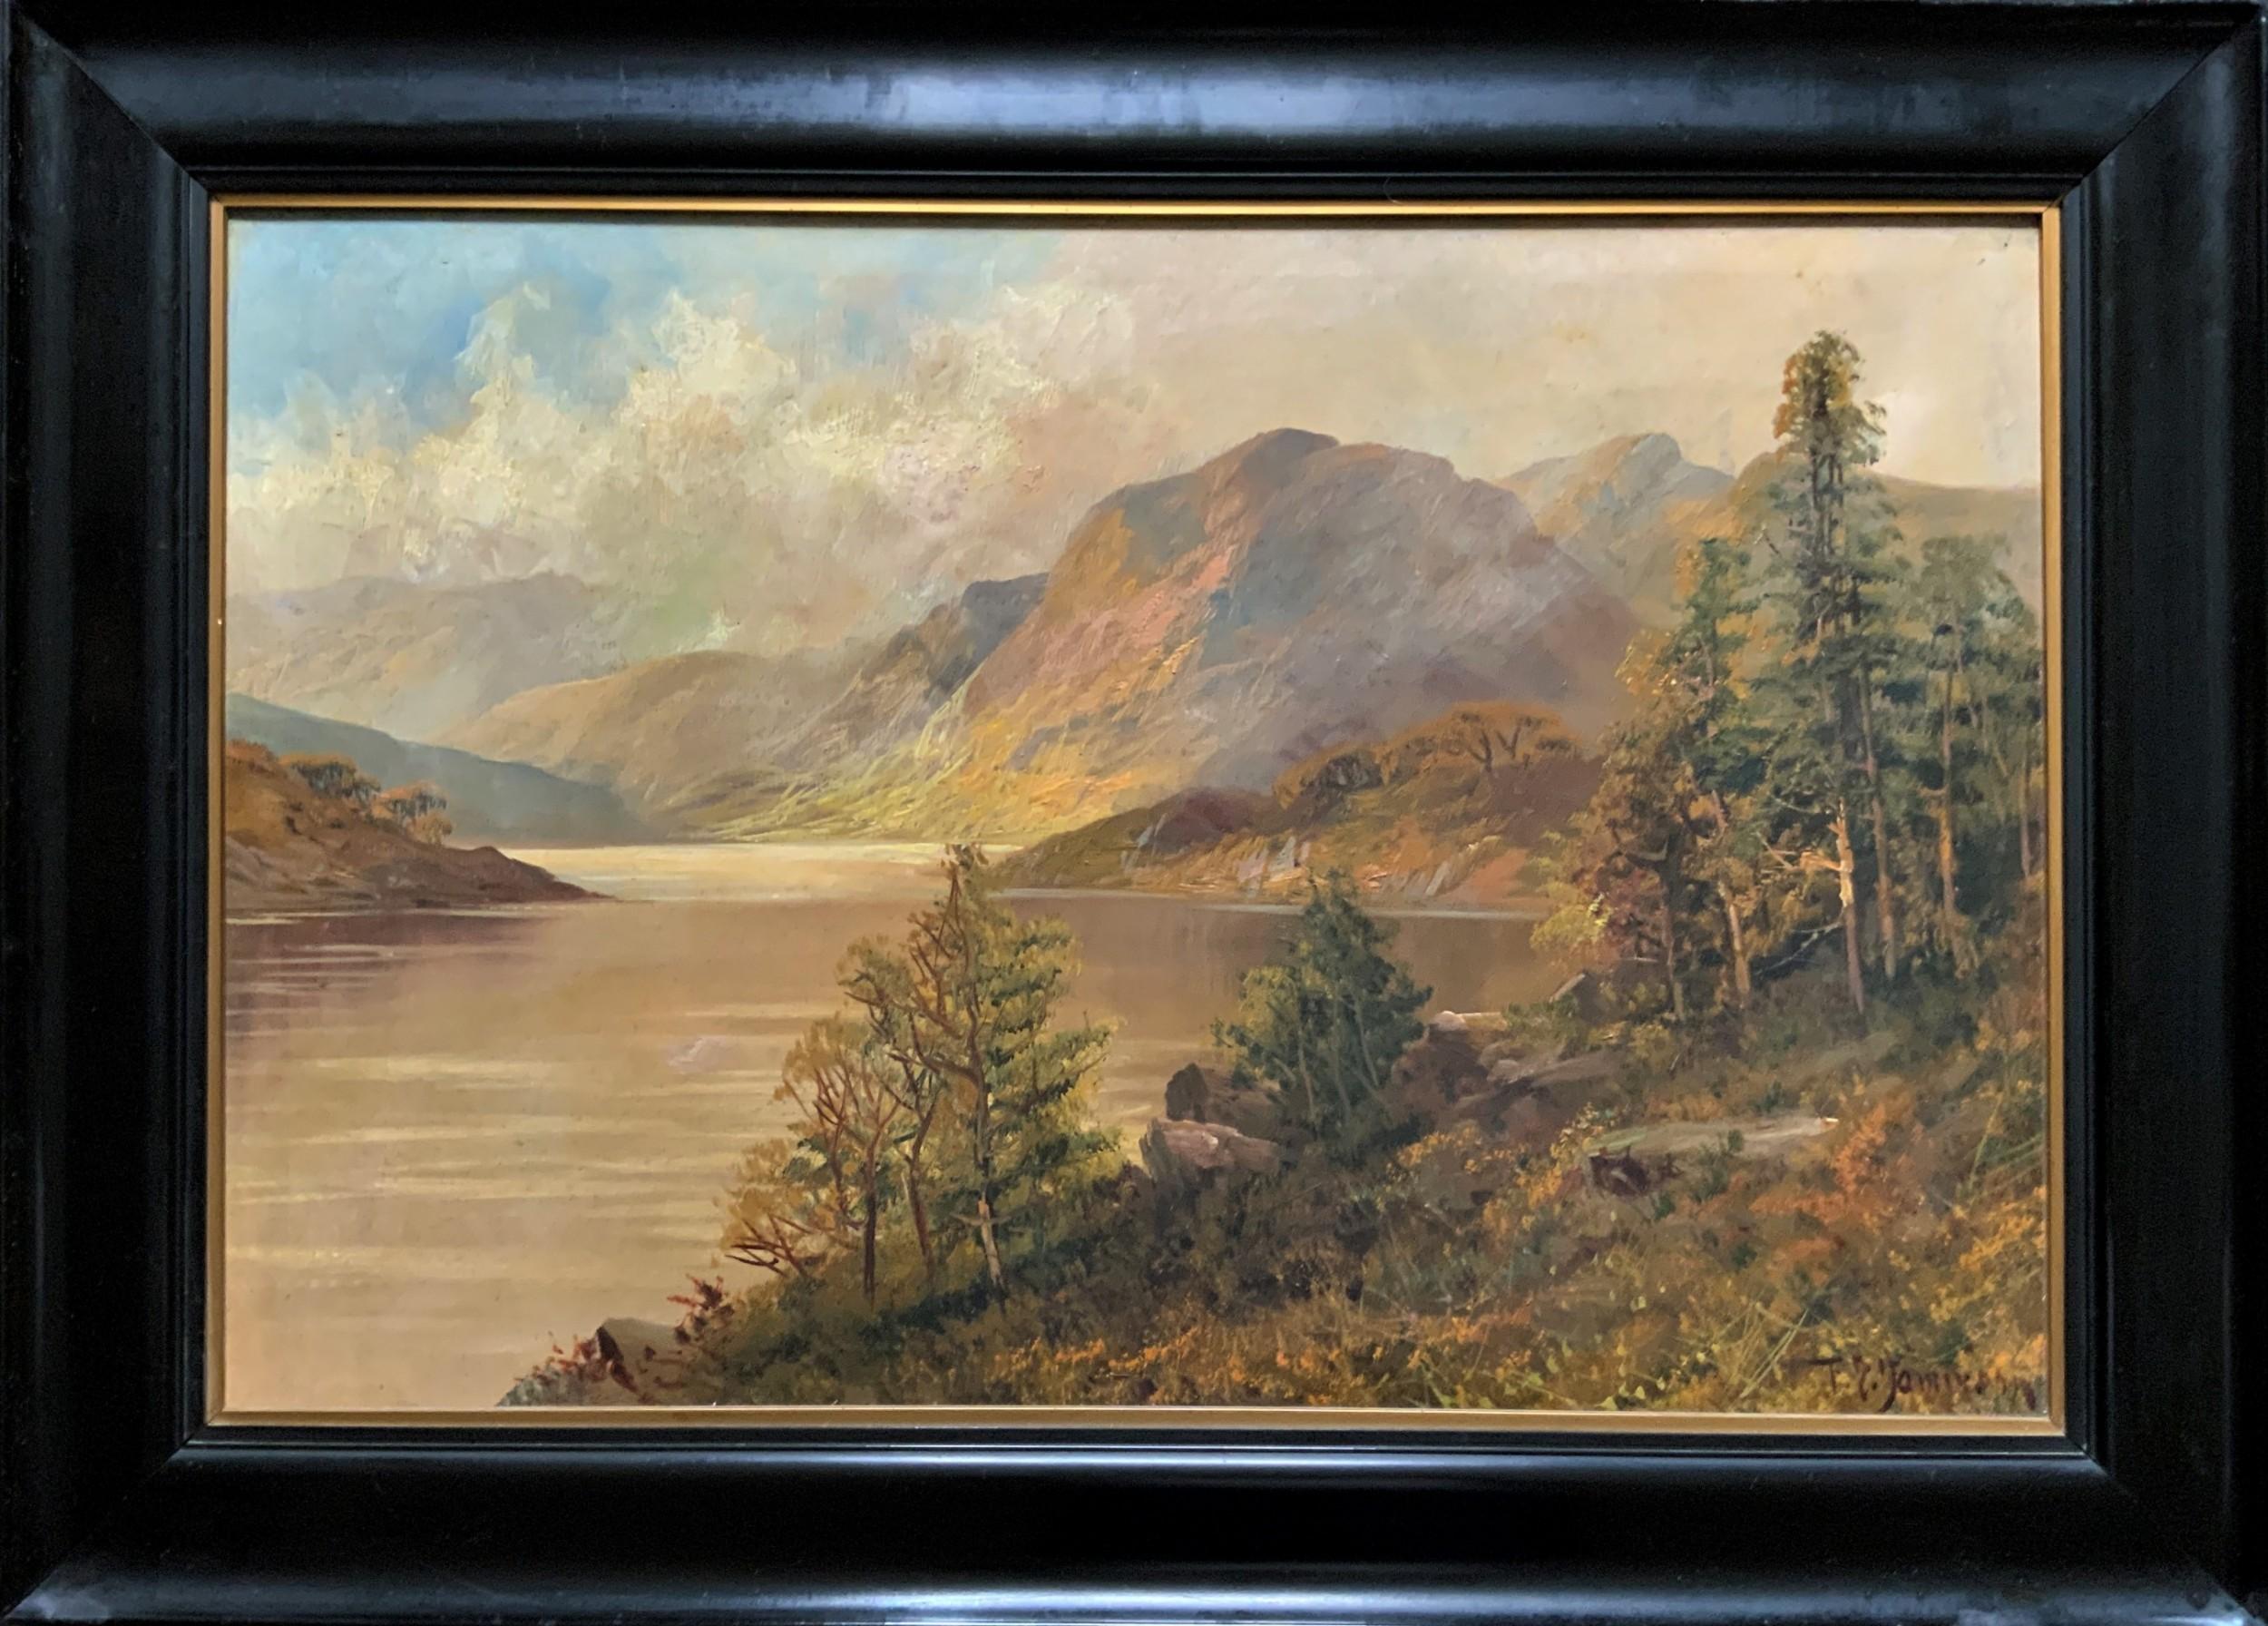 'f e jamieson' an original scottish highland loch landscape oil painting for tlc